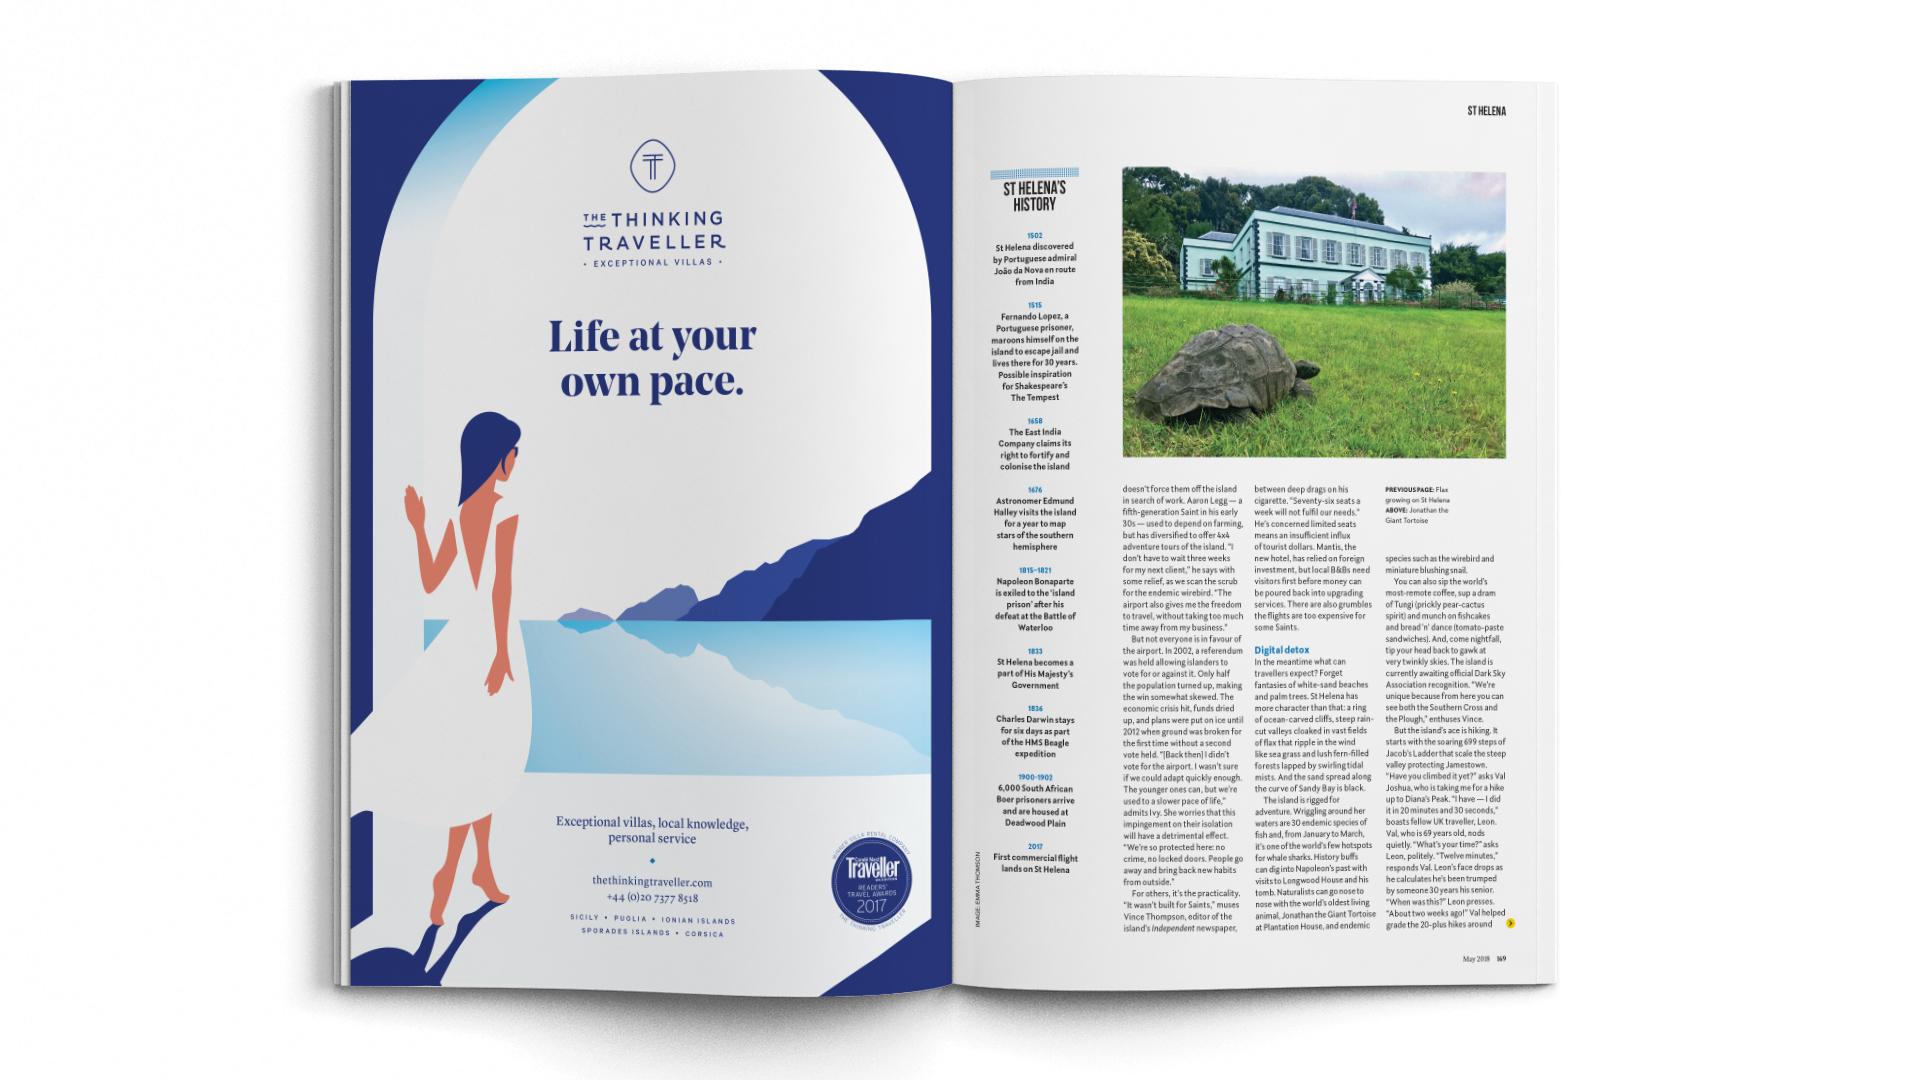 A4-Magazine-DPS-NGT-TT-Report-St-Helena-2